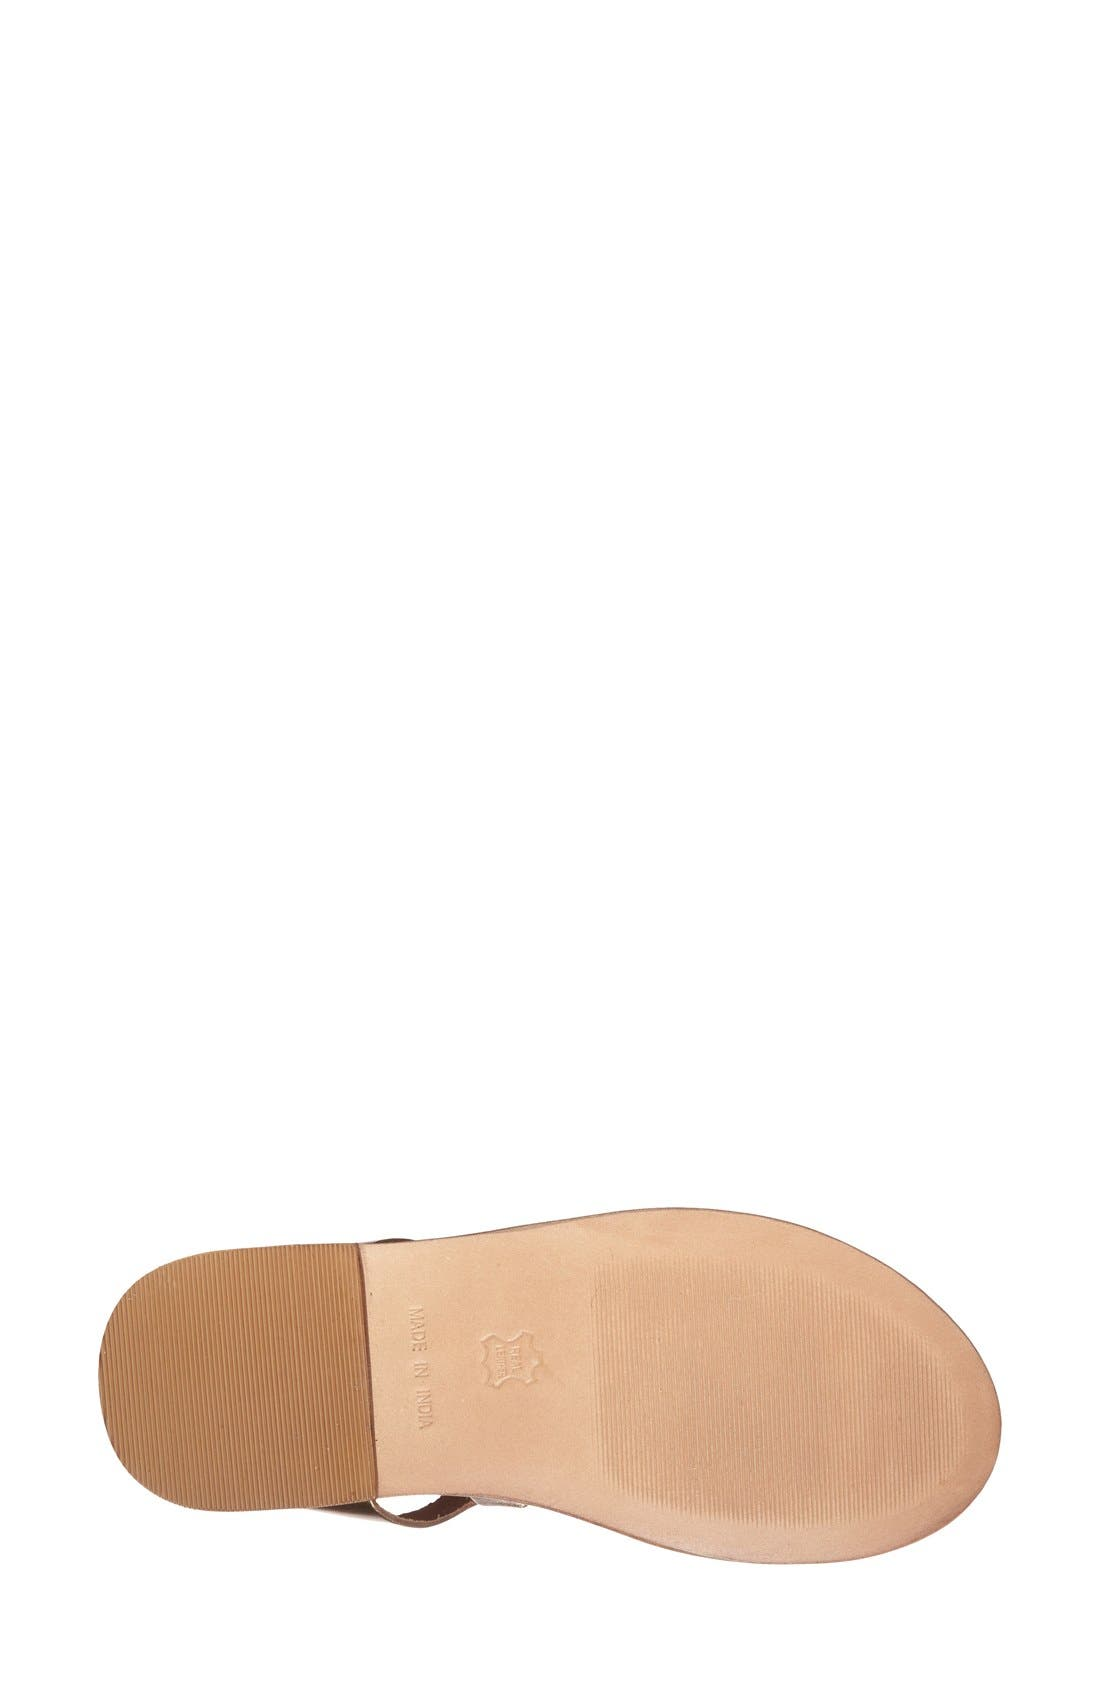 Alternate Image 3  - Topshop 'Fig' Cutout Lace-Up Gladiator Sandal (Women)